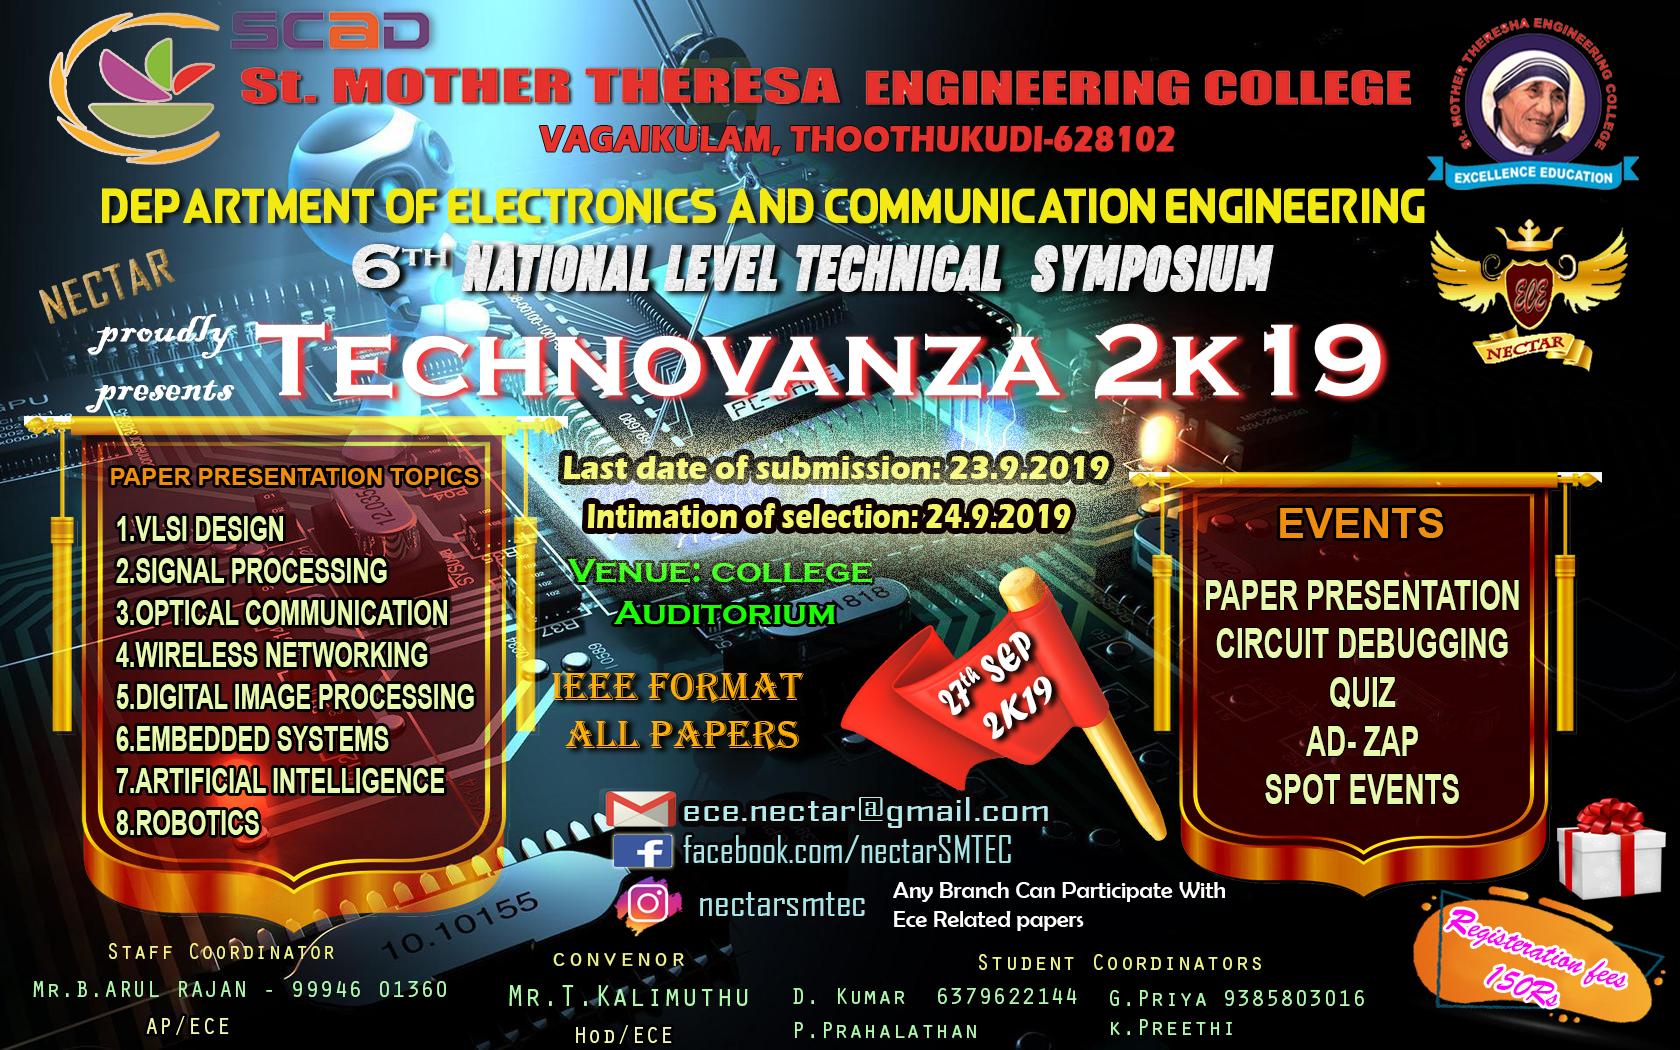 Technovanza 2K19, Thoothukudi, Tamil Nadu, India